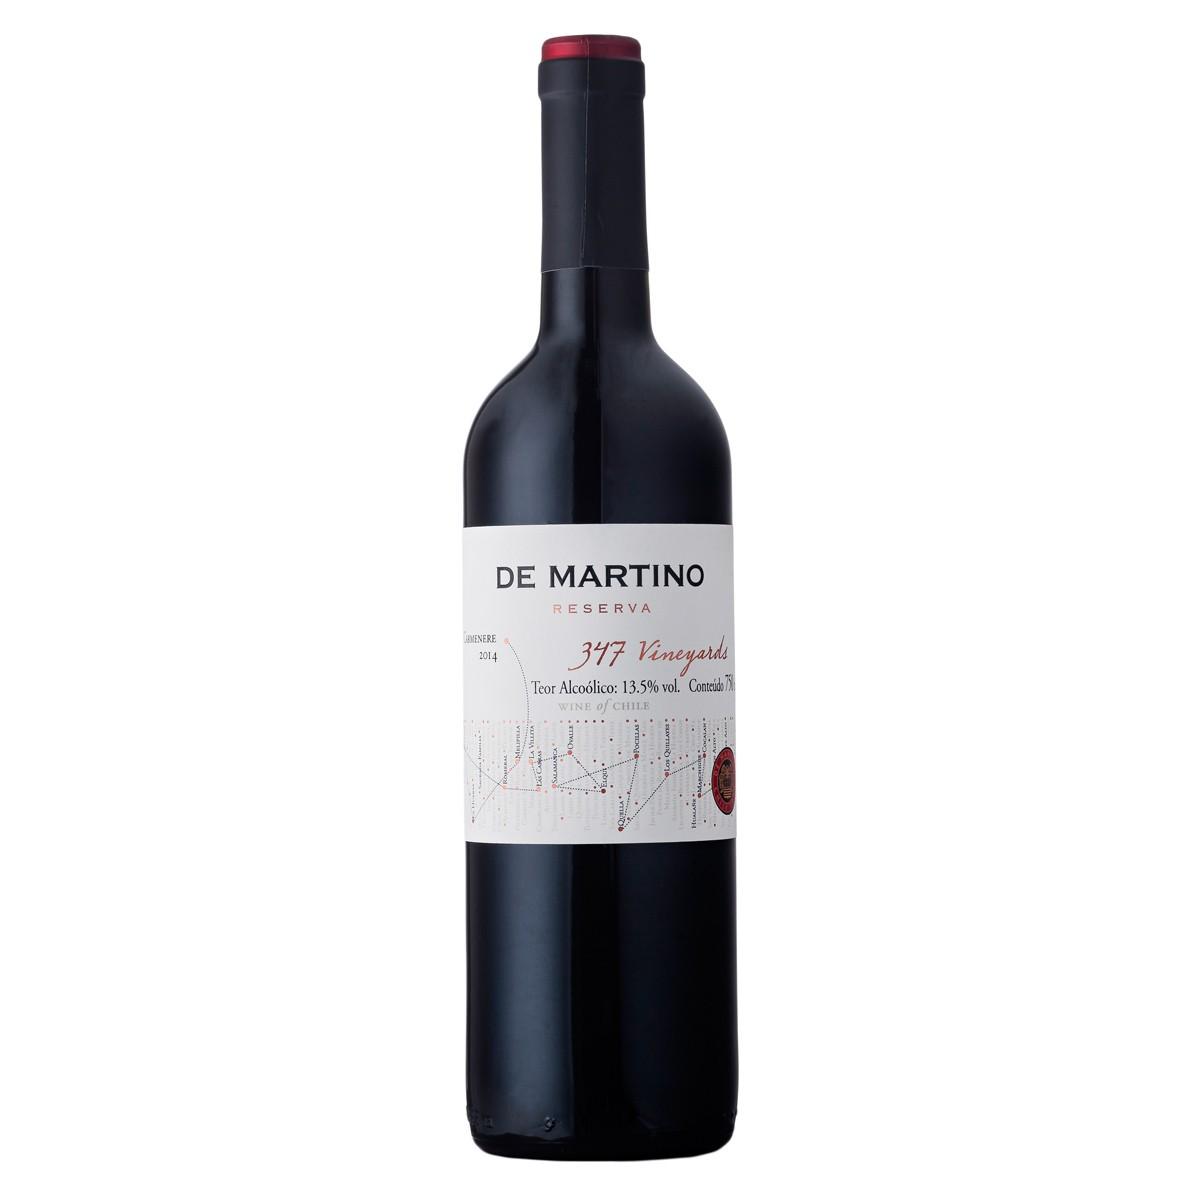 De Martino Carmenere Reserva 347 Vineyards